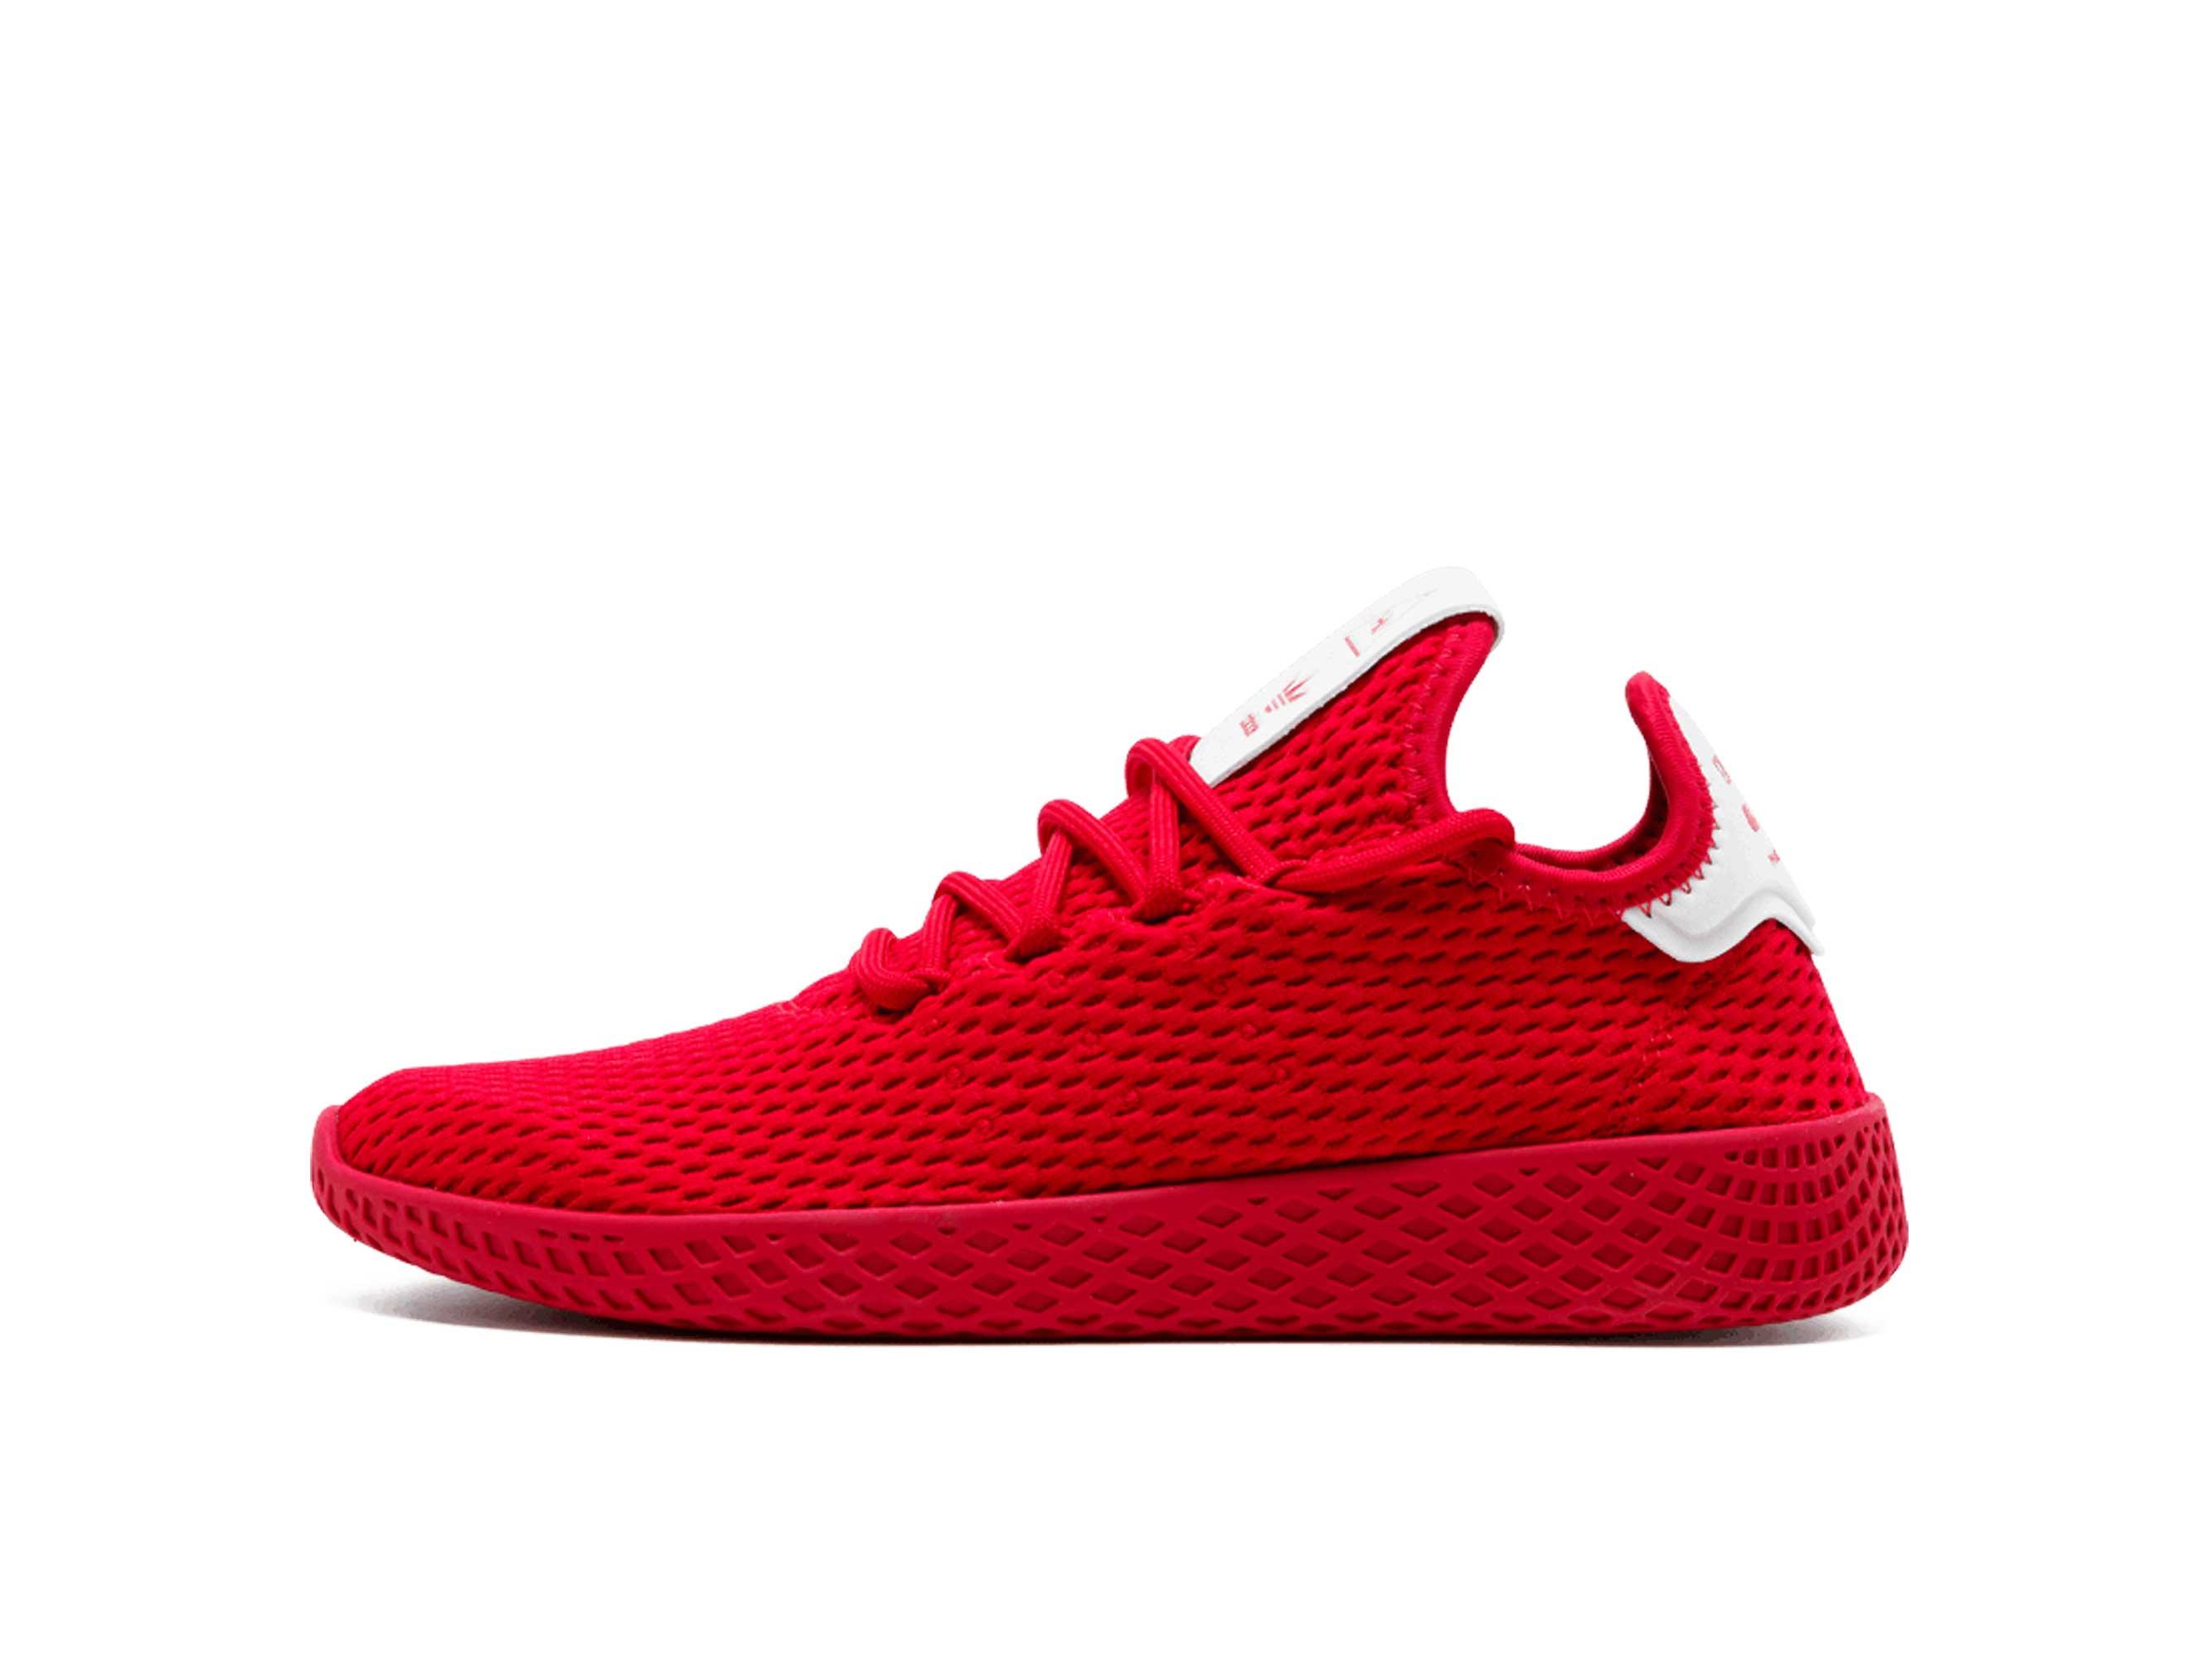 adidas Pharrell Williams tennis HU red